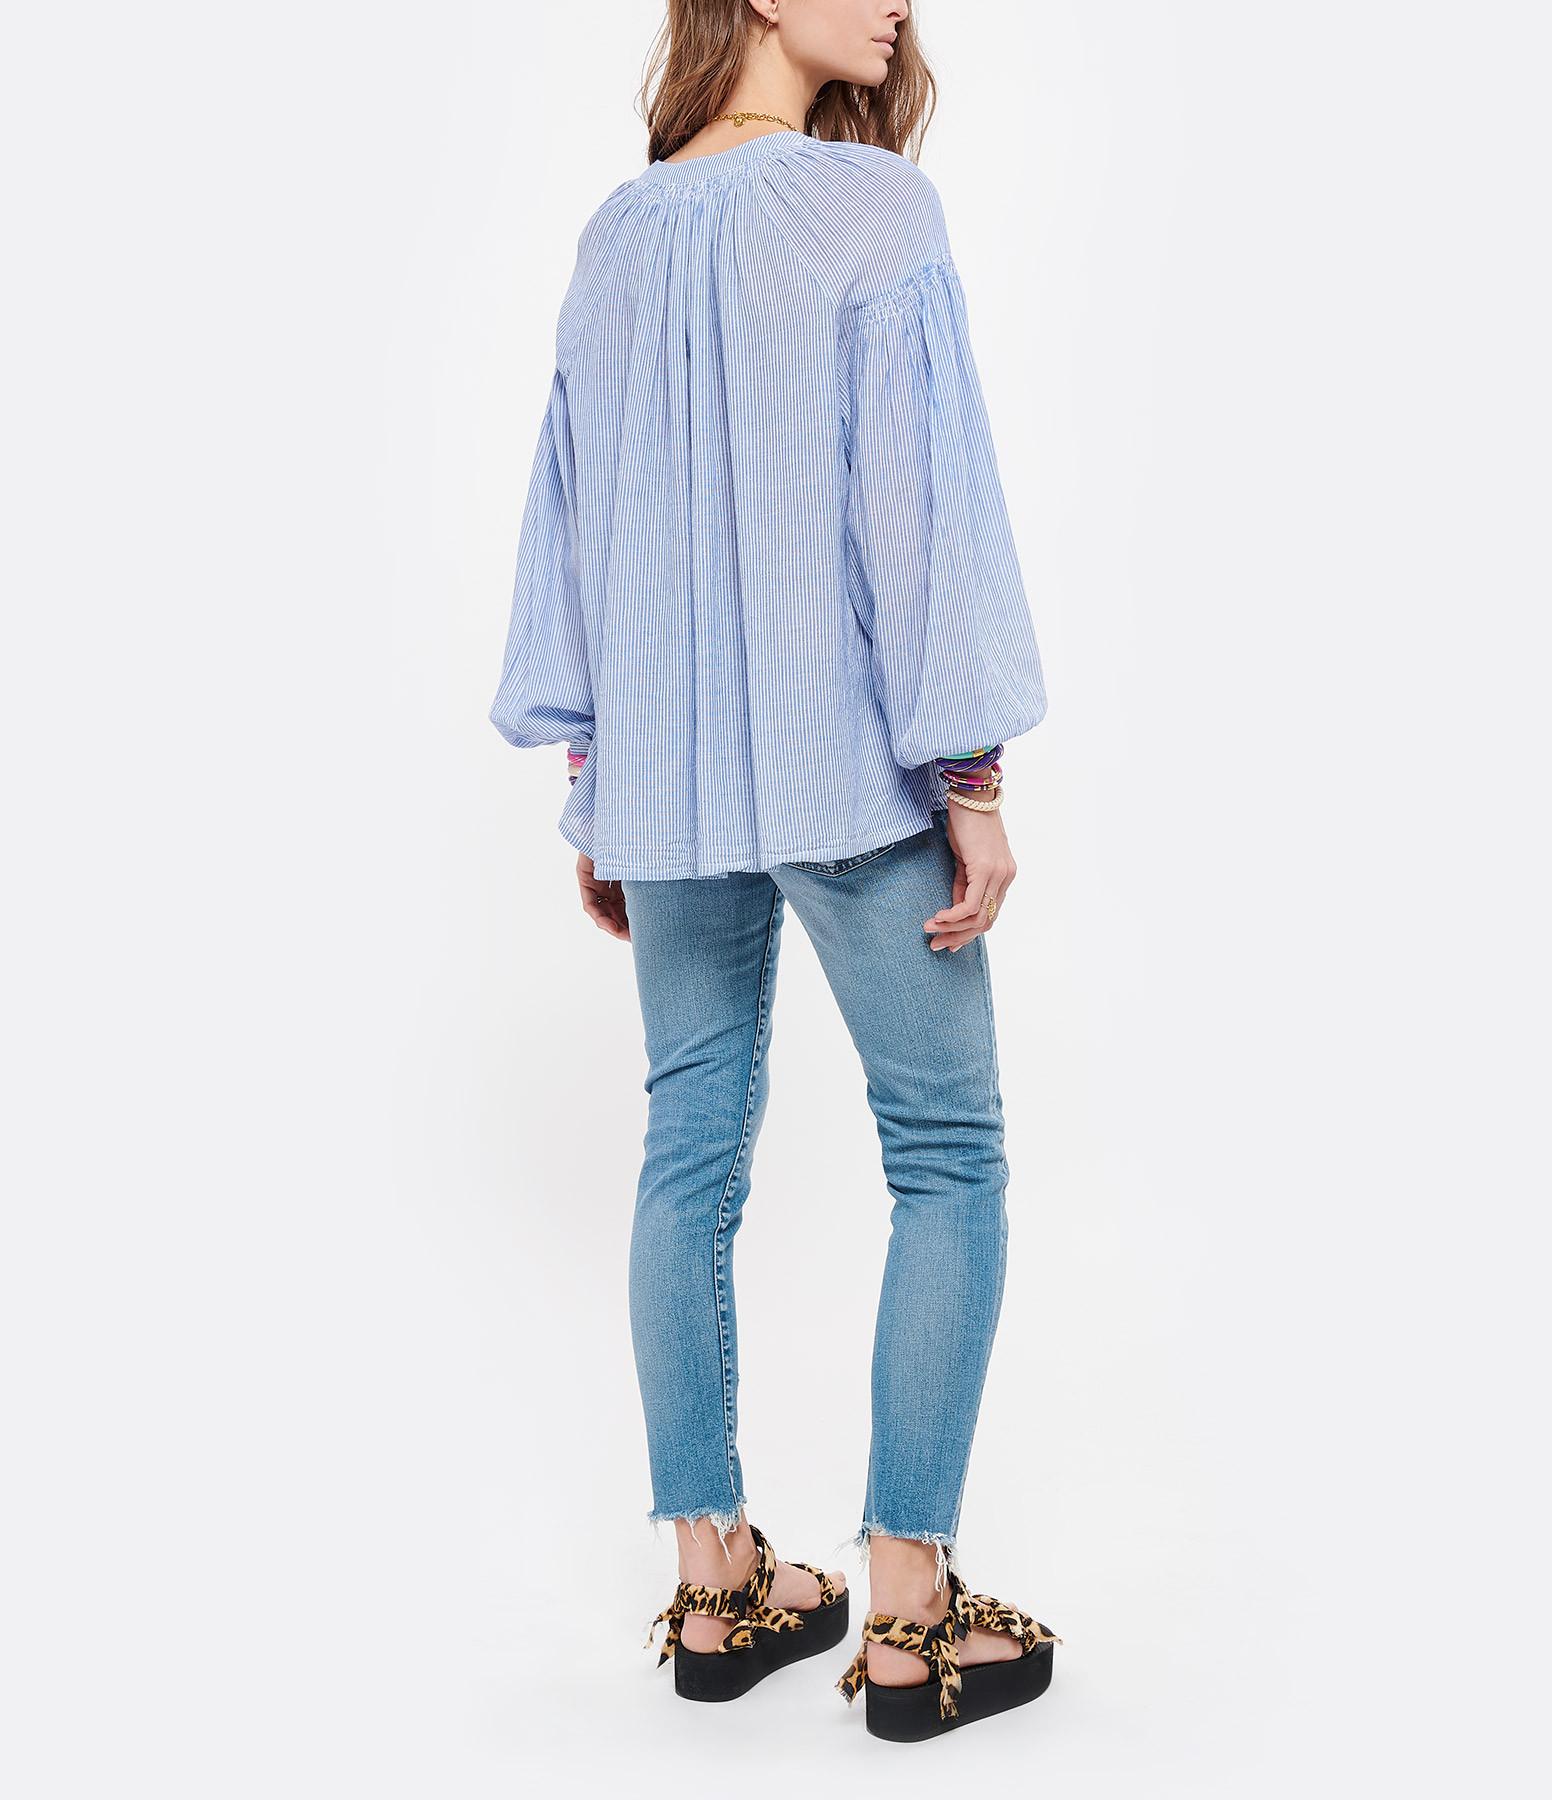 VANESSA BRUNO - Blouse Nipoa Rayures Bleu Blanc